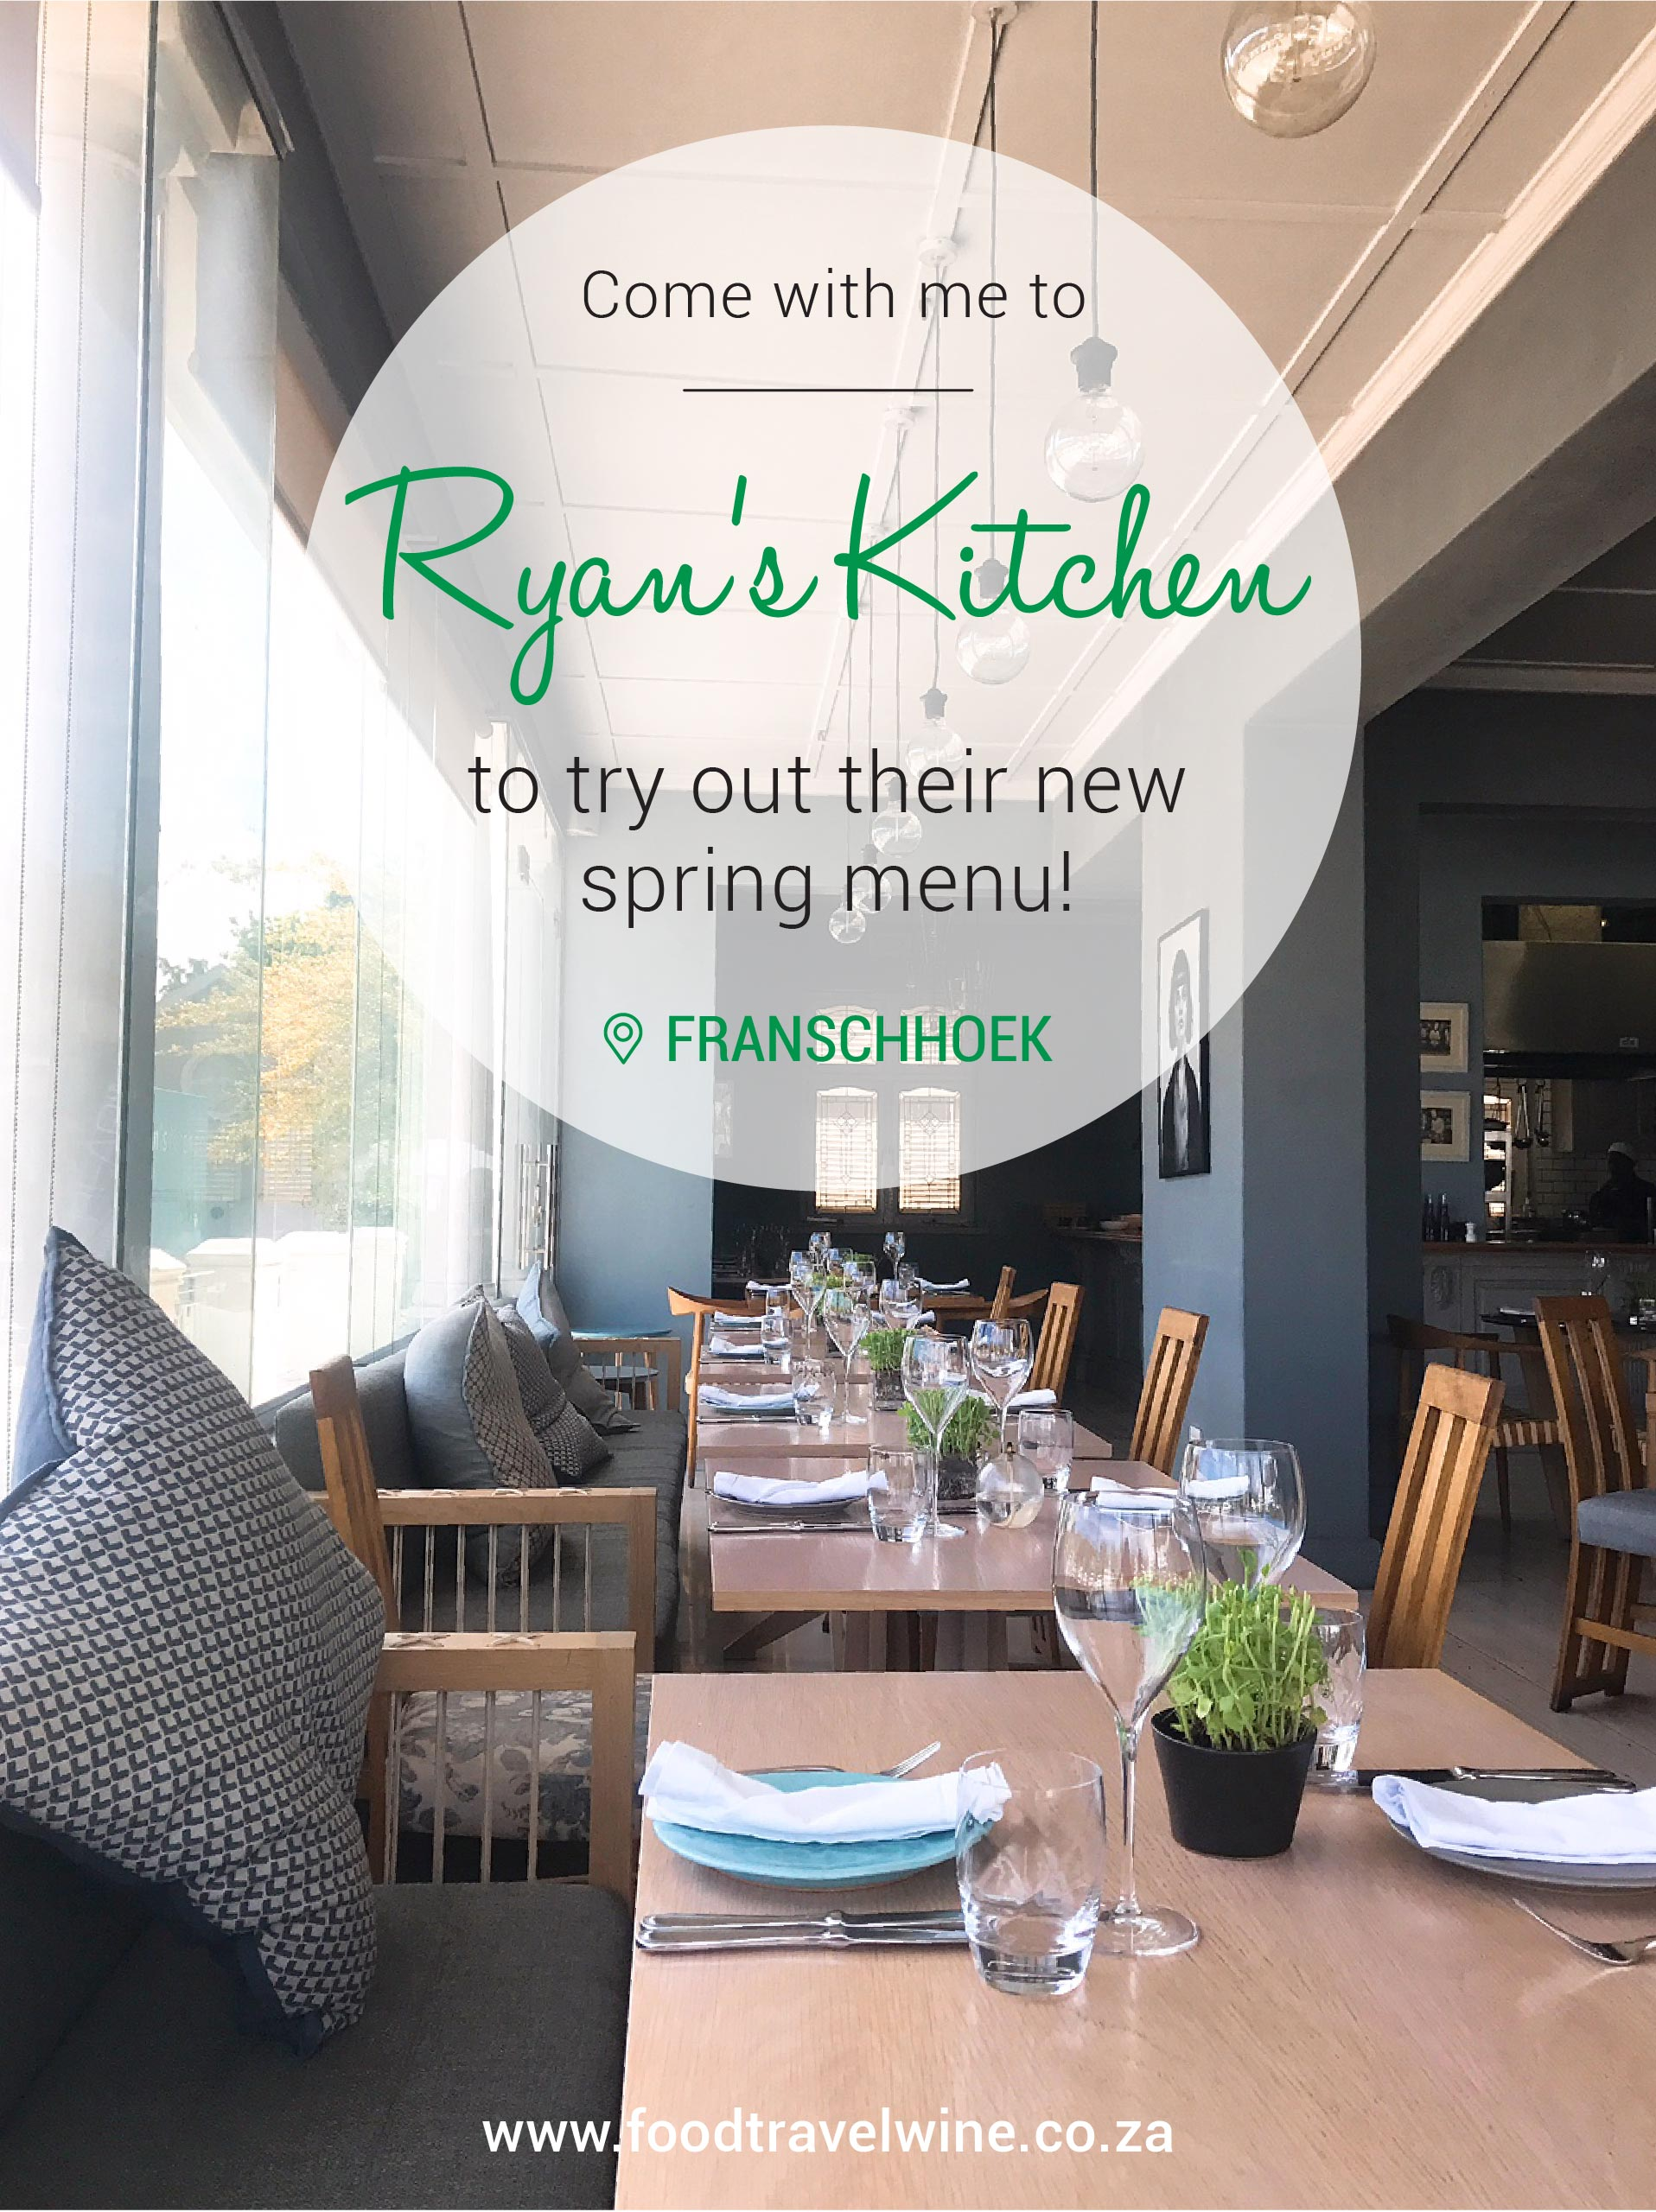 4 Course Spring Menu At Ryans Kitchen